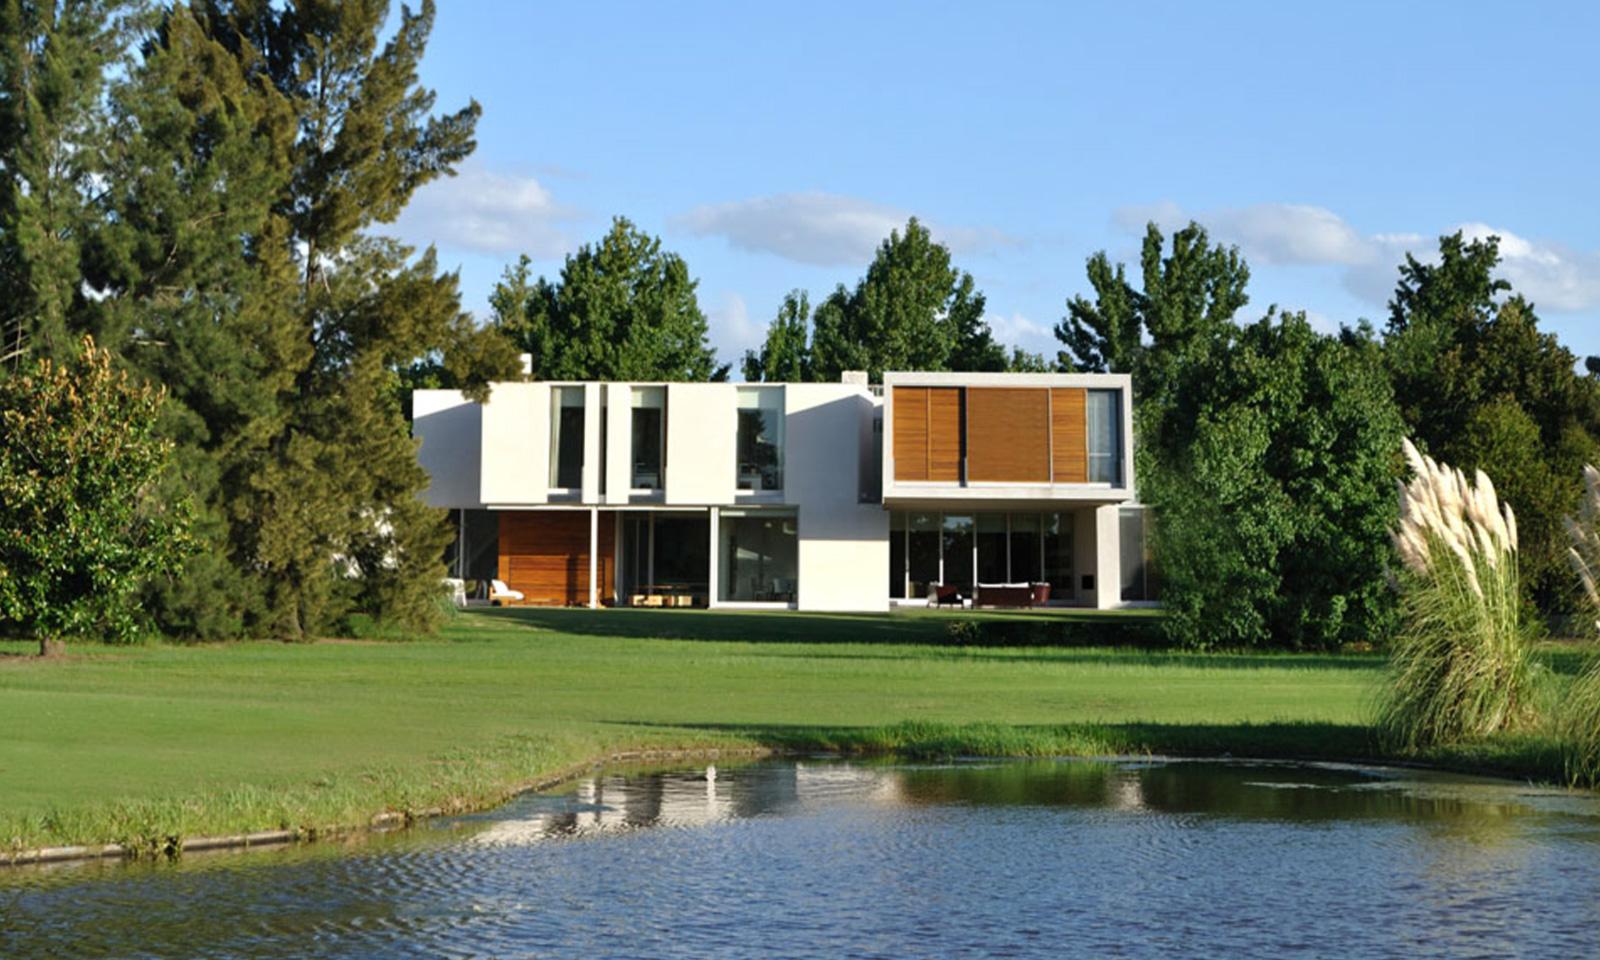 Casa As by Architect Alric Galindez